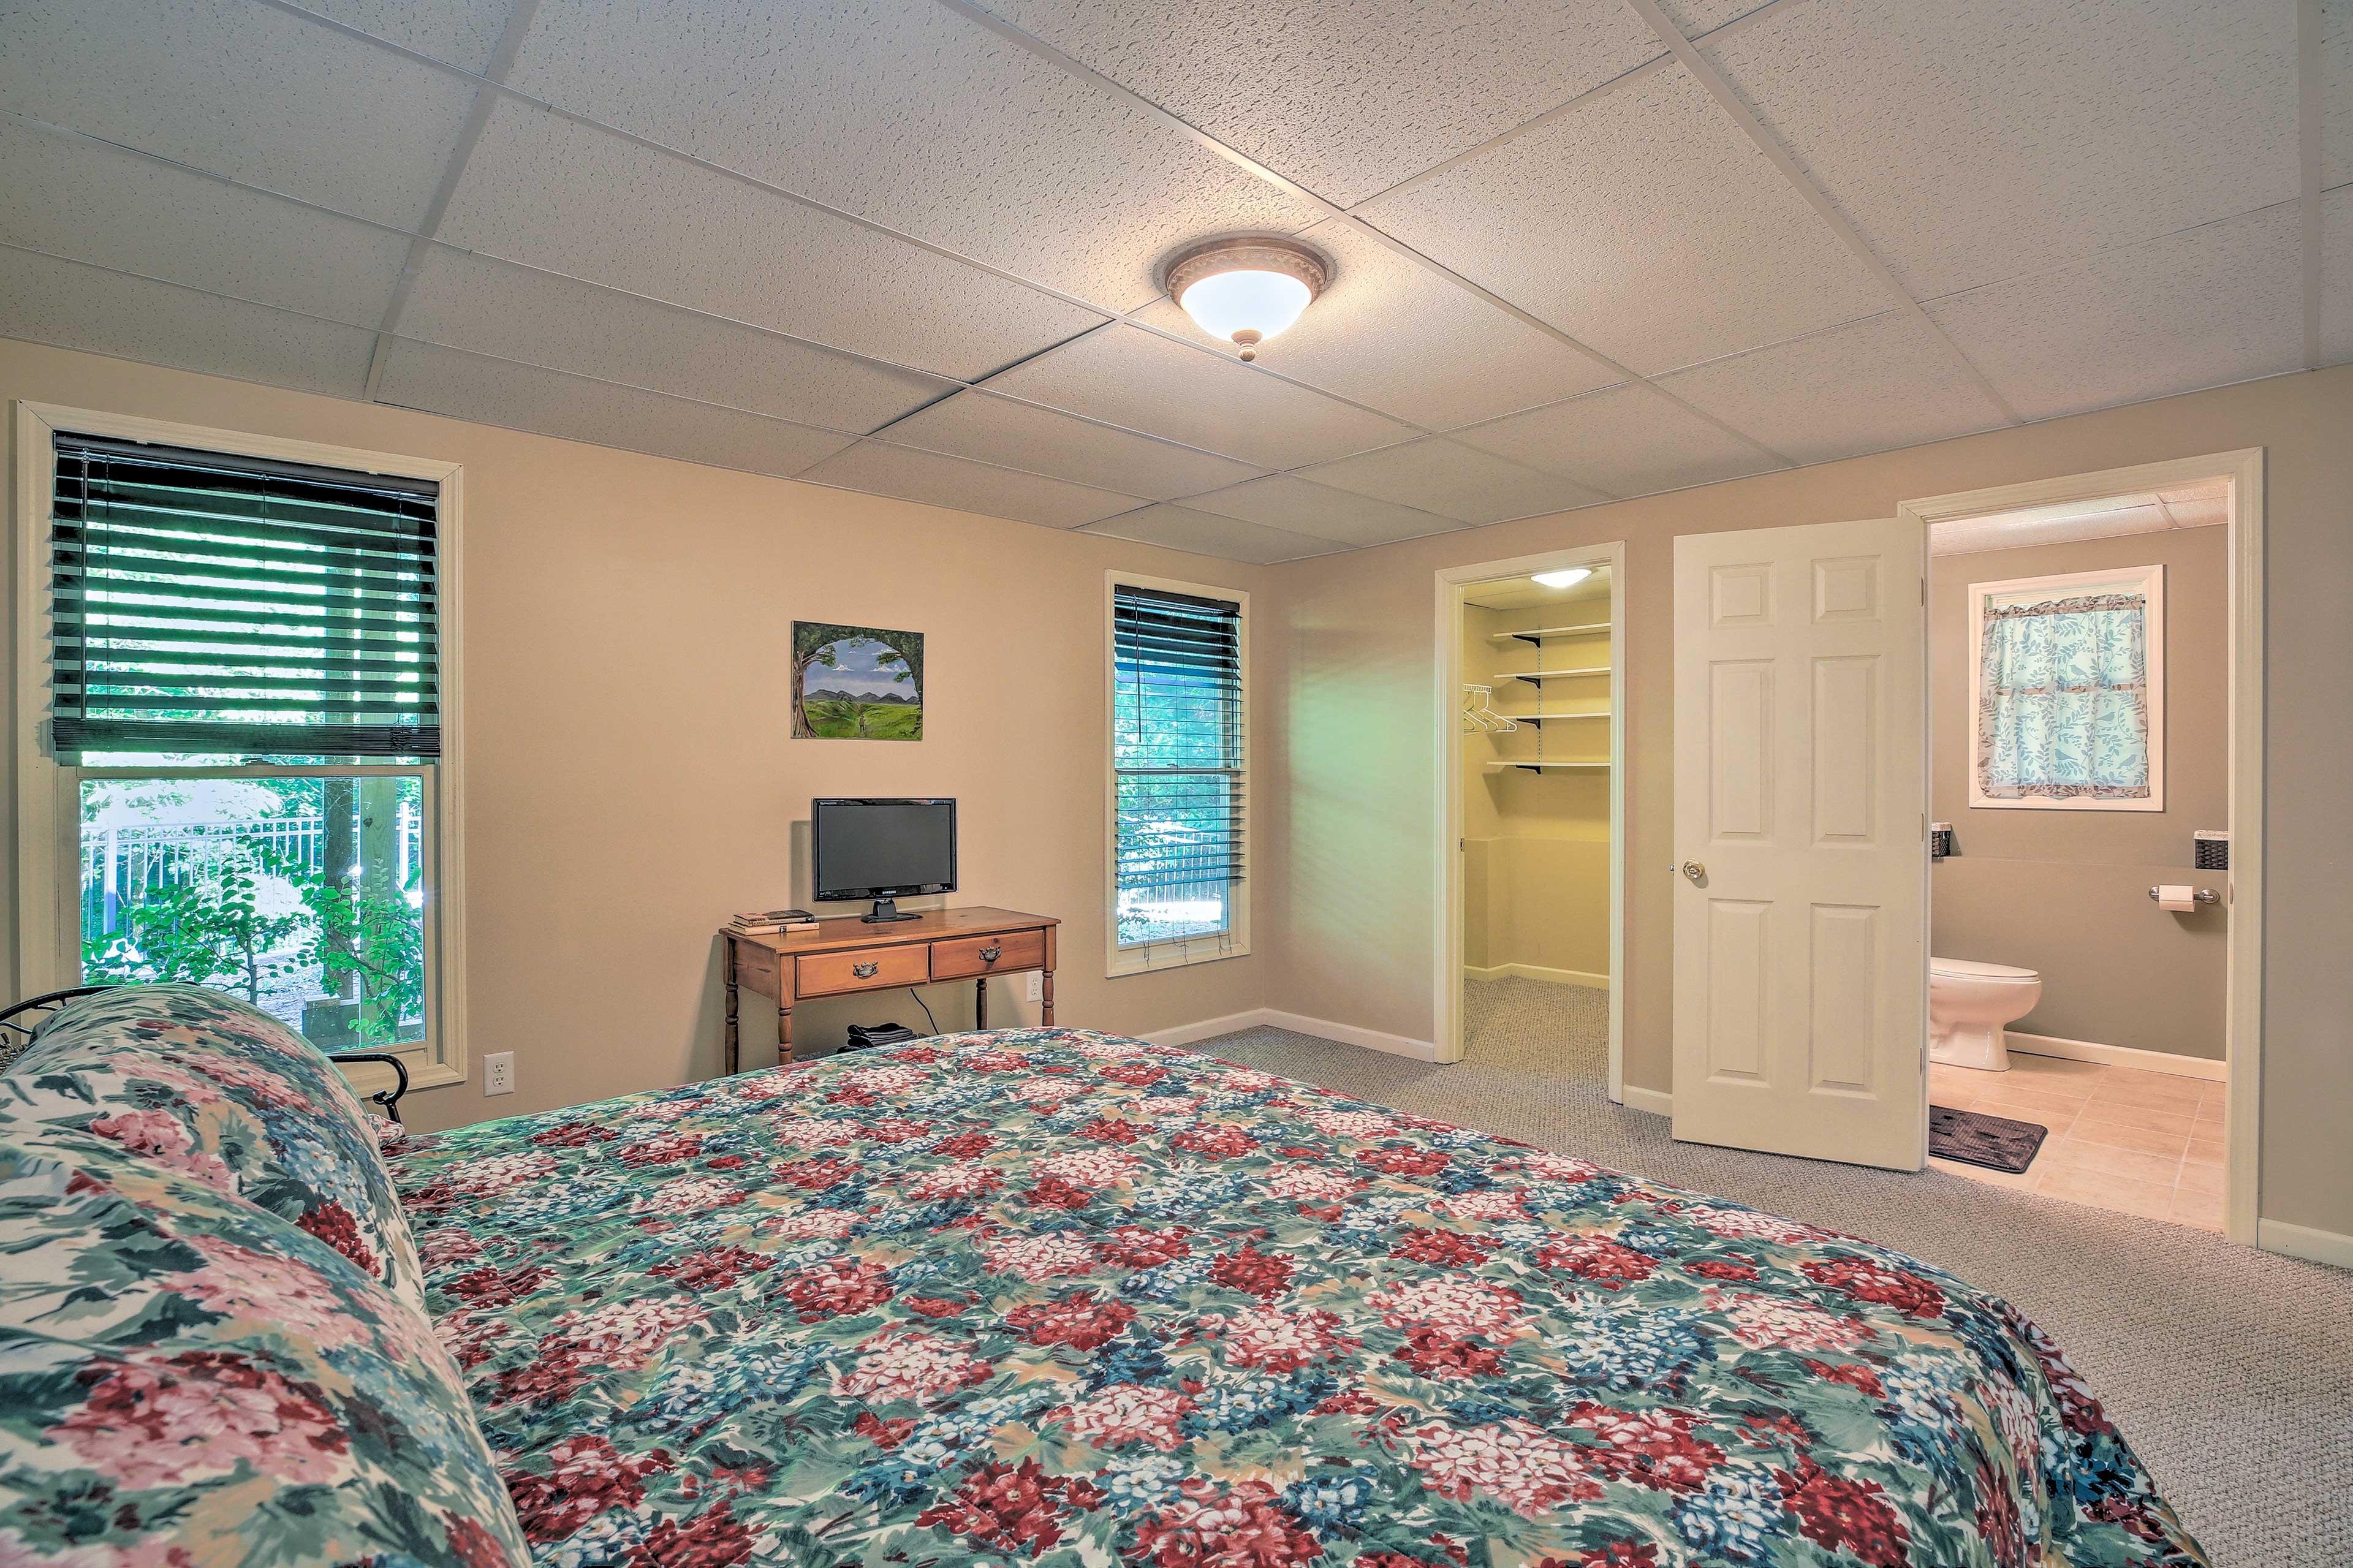 This bedroom hosts a queen bed, computer monitor and en-suite bathroom.